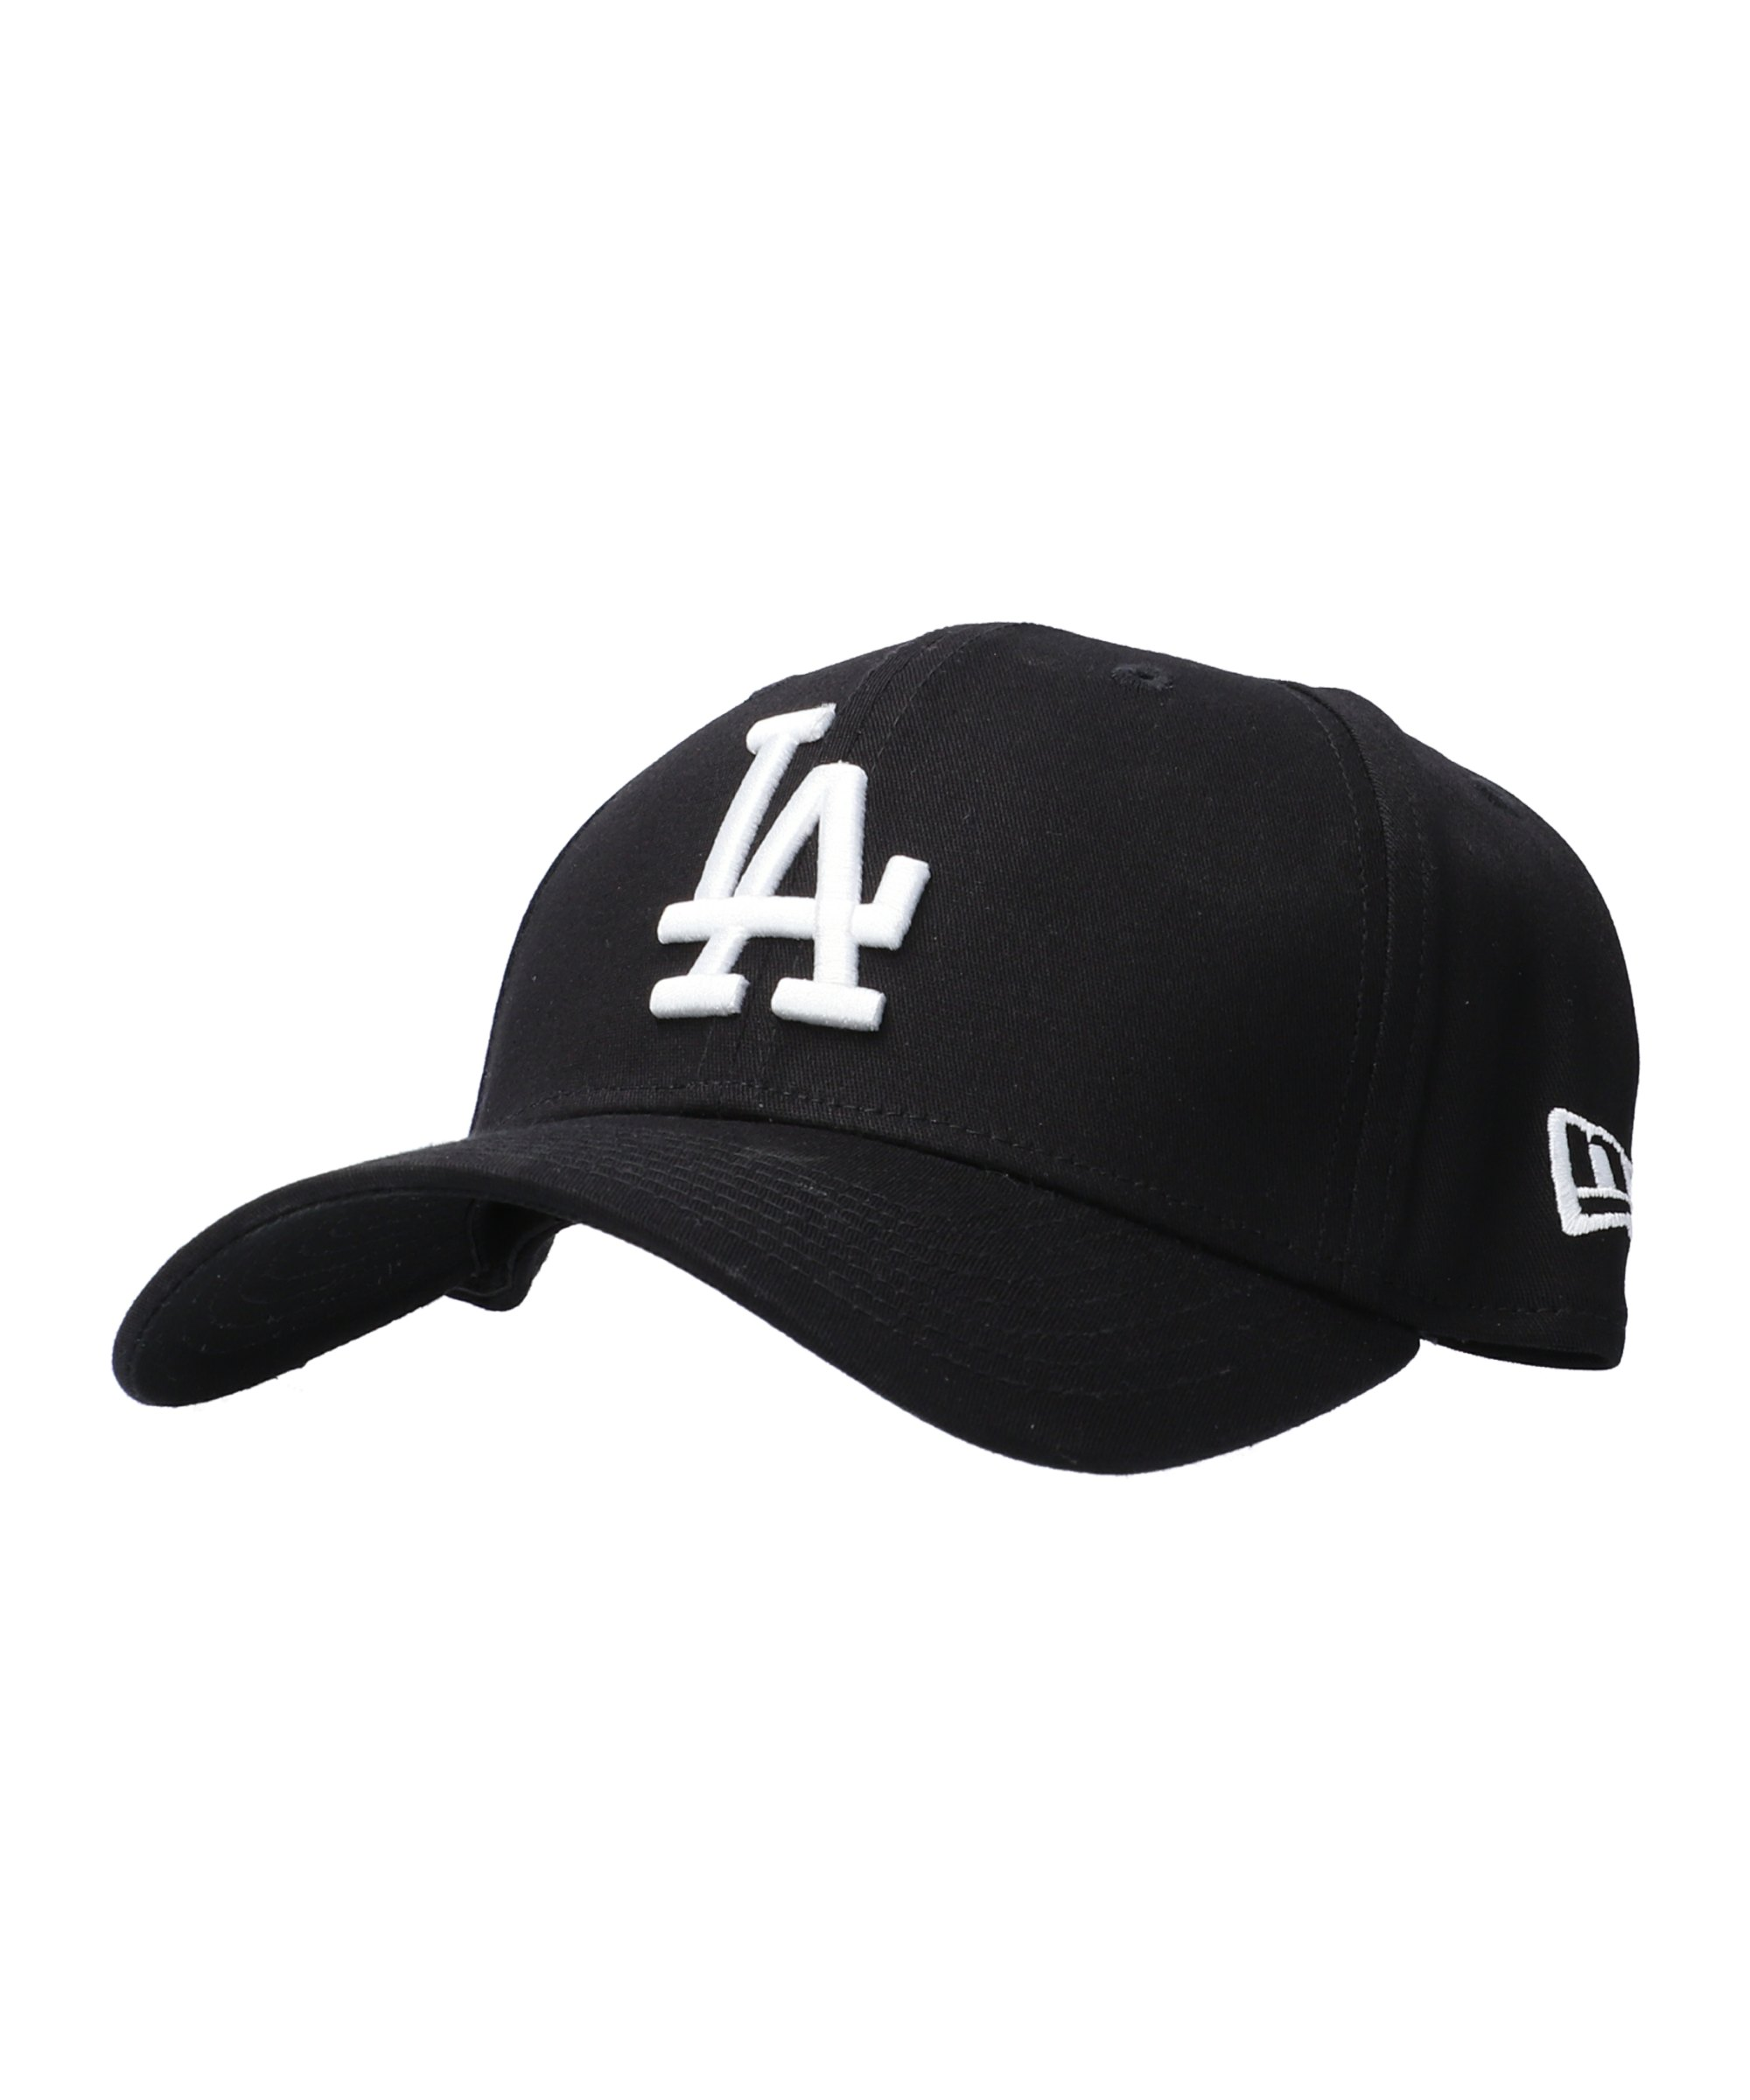 New Era Los Angeles Dodgers 39Thirty Cap Schwarz - schwarz